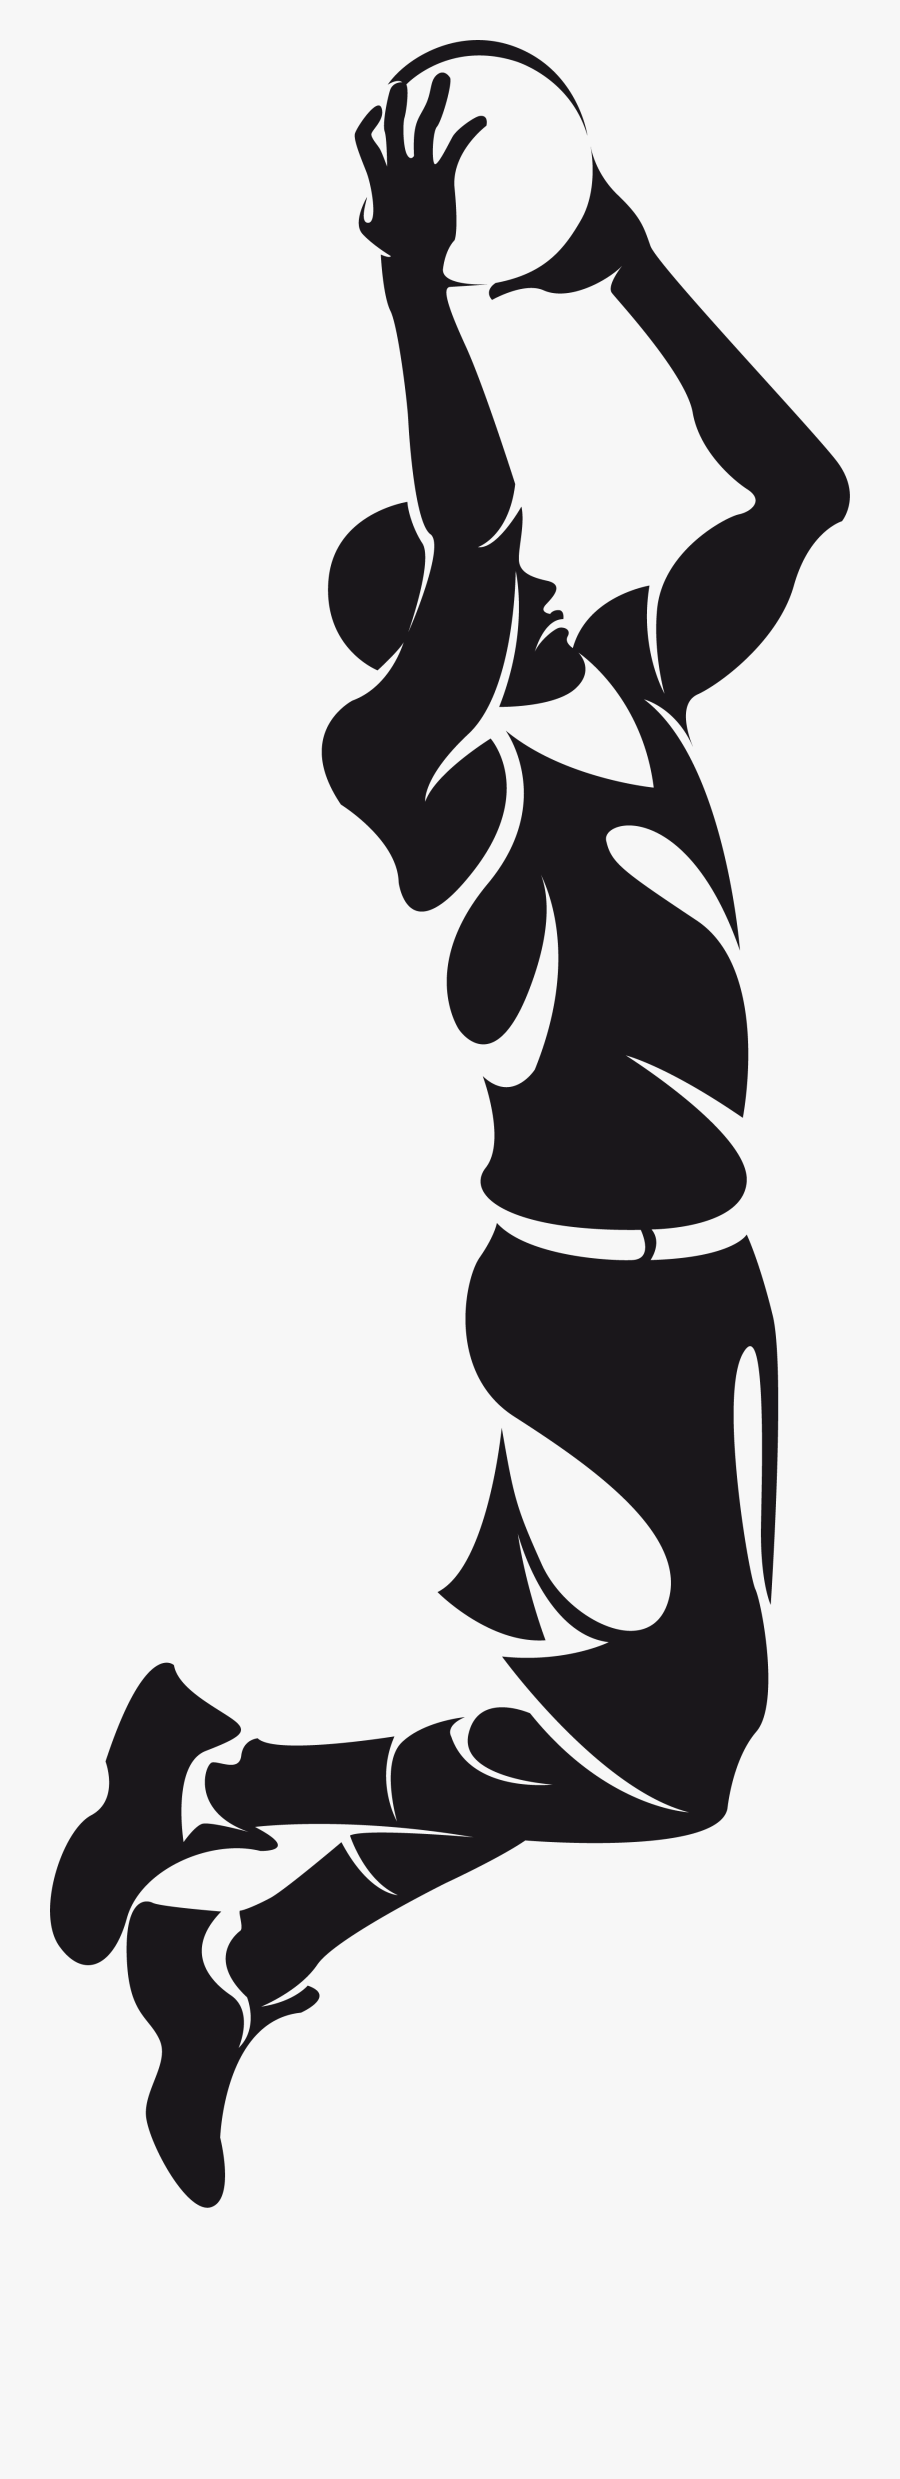 Boys Basketball Clipart 101 Clip Art Graphic Freeuse - Boys Basketball Clip Art, Transparent Clipart